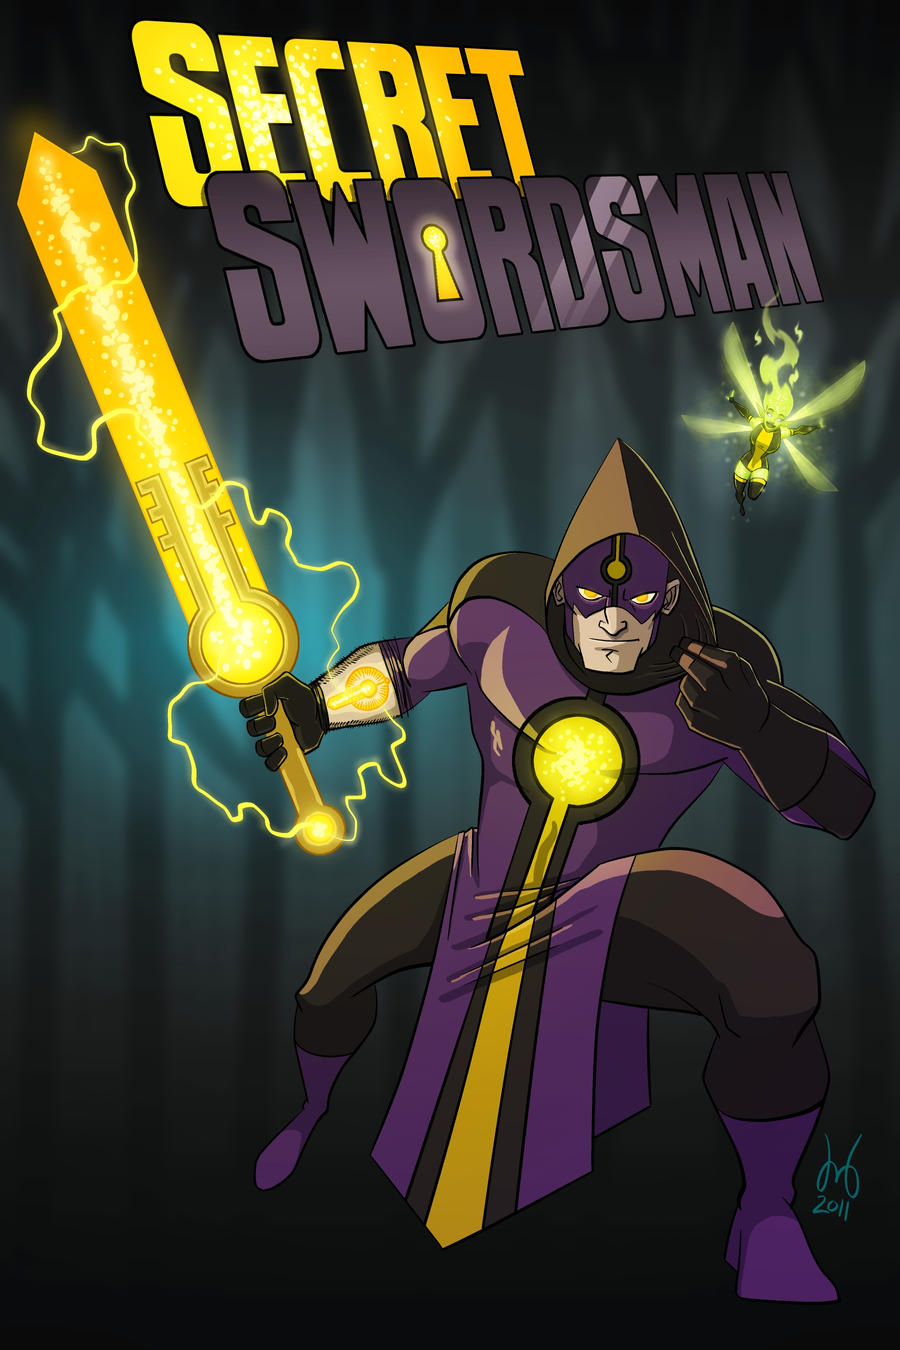 Secret Swordsman by DBed